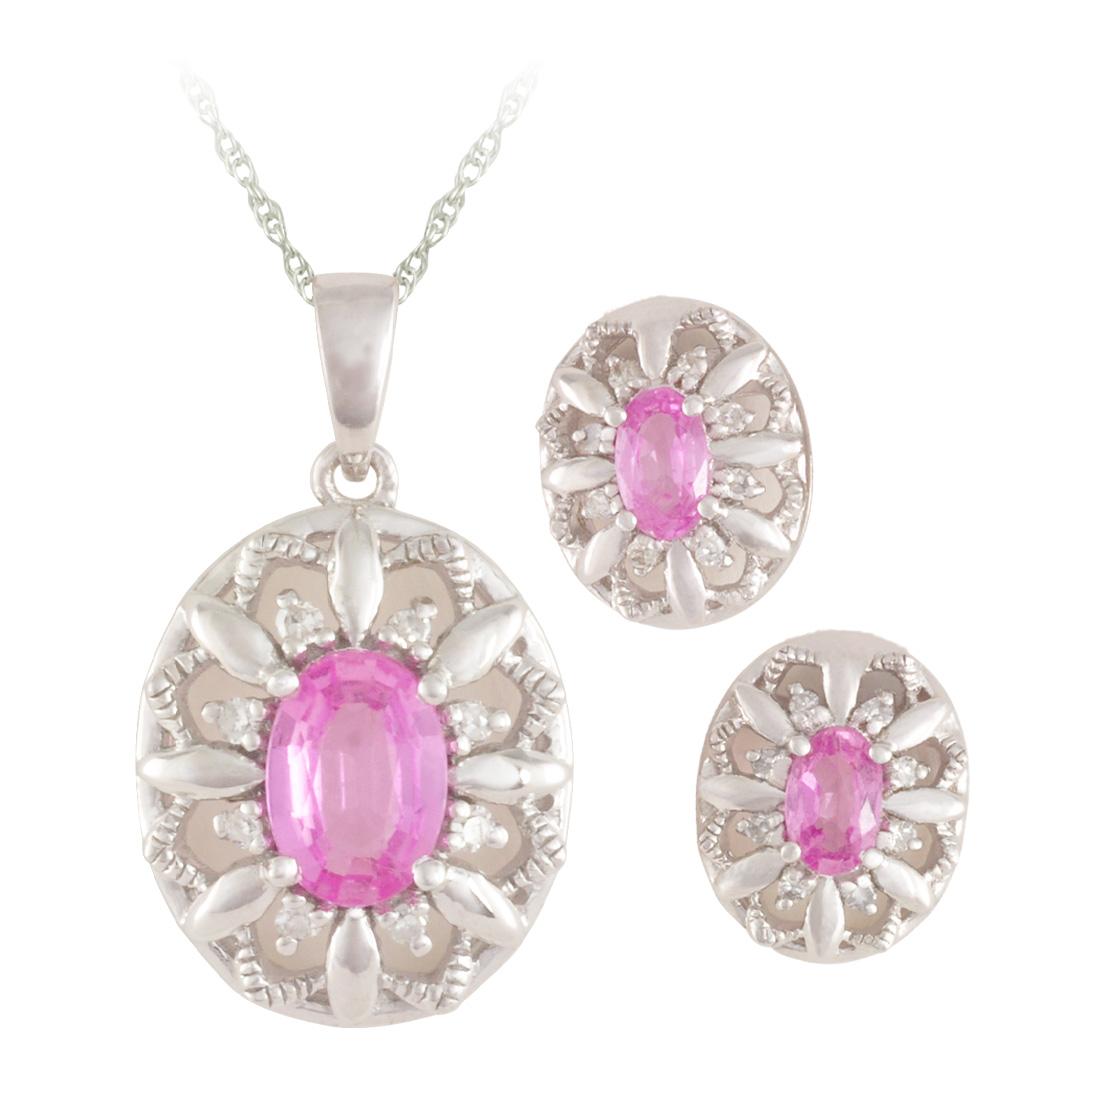 Sapphire and Diamond Jewellery Set